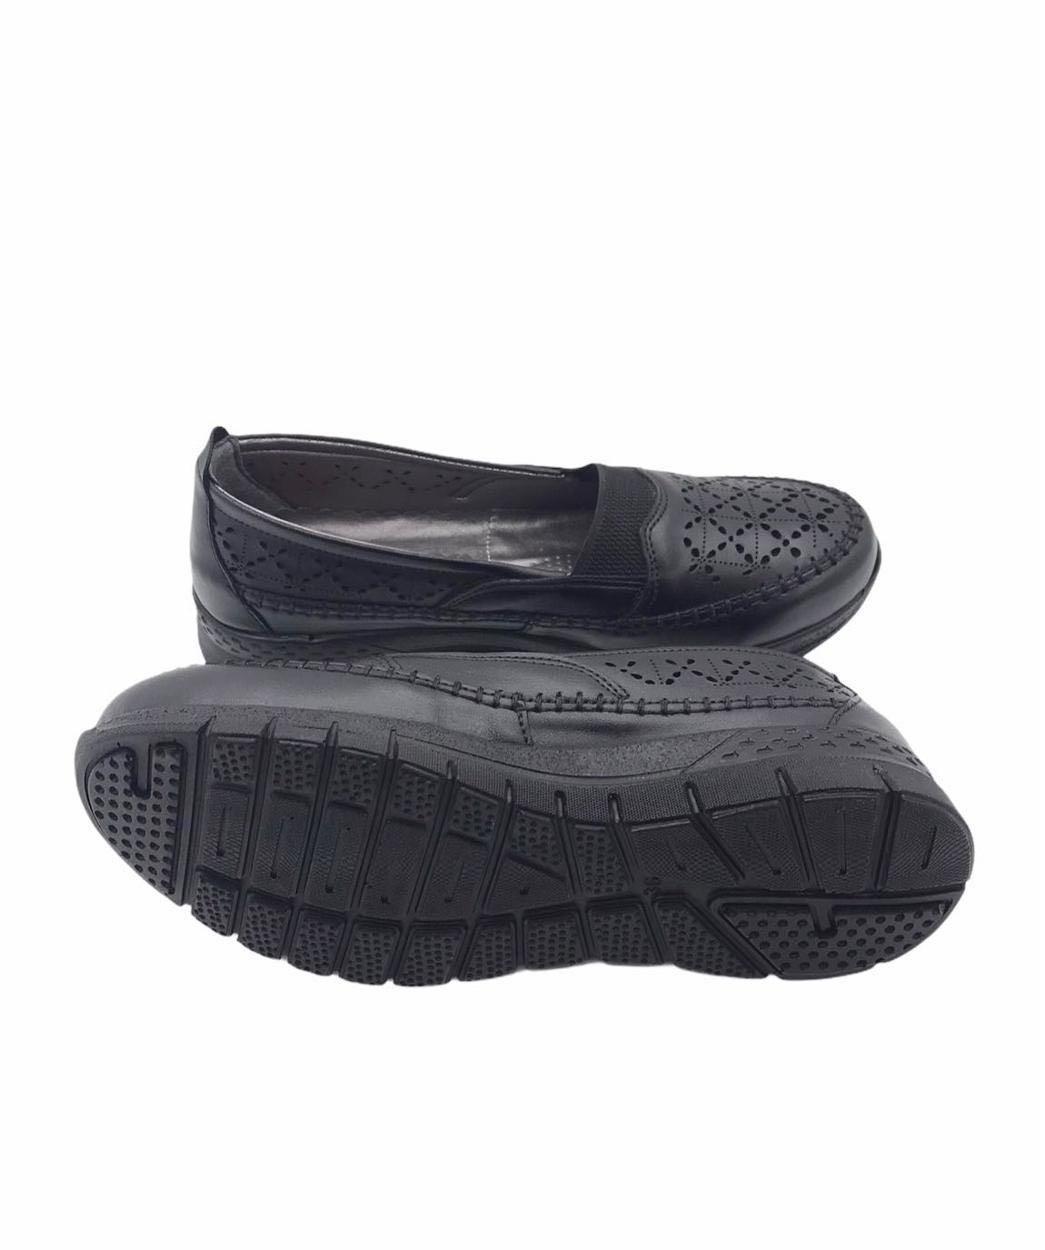 Muya Oxford/Loafer